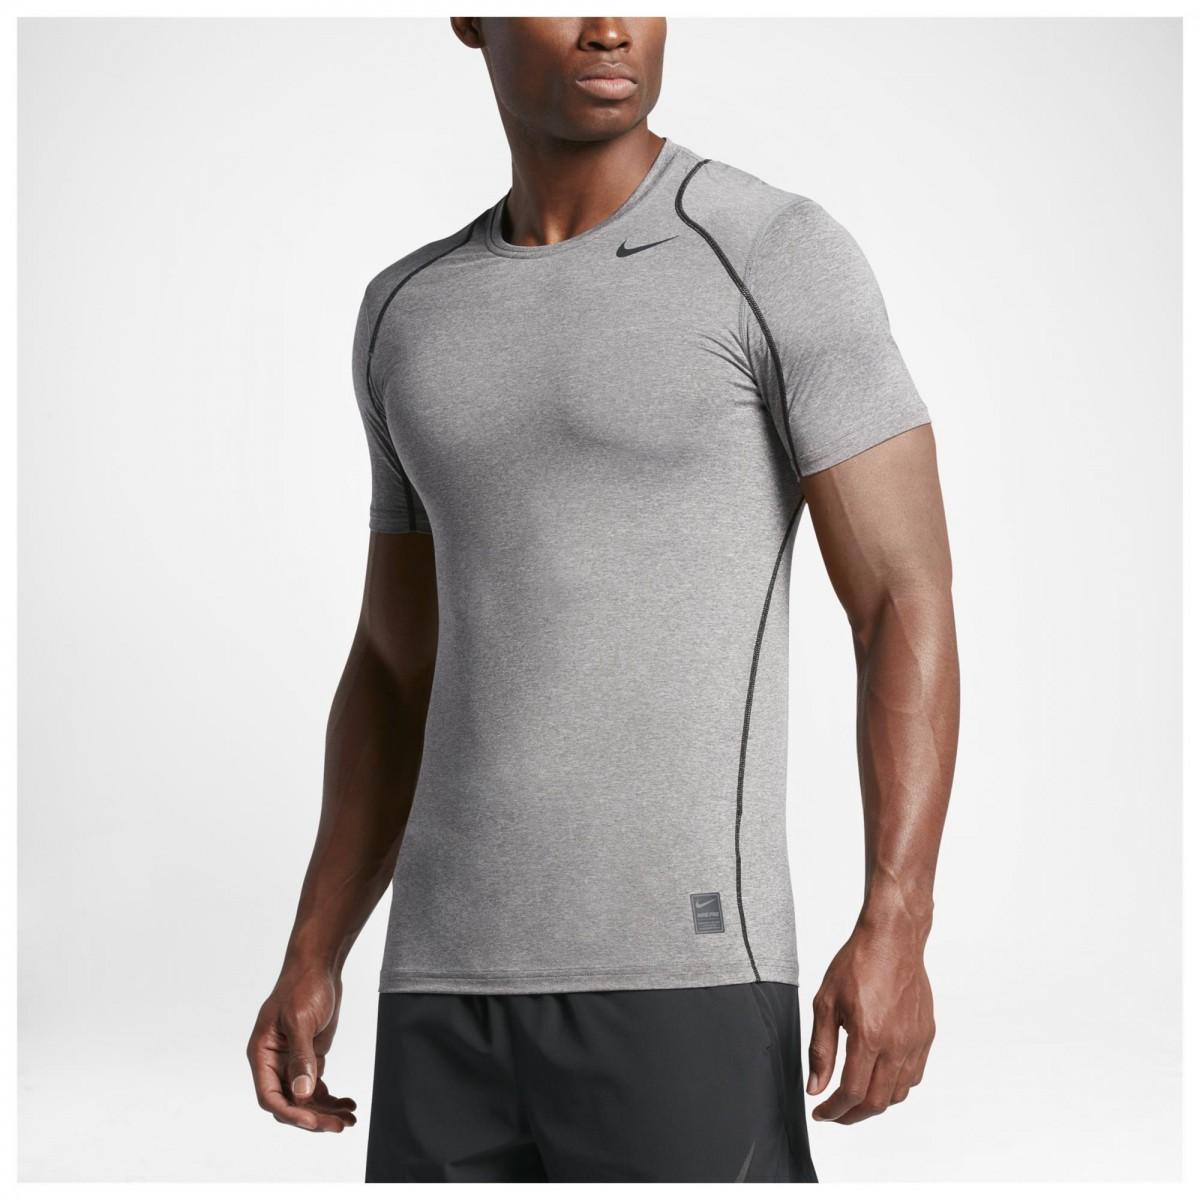 792dade55b099 Bizz Store - Camiseta de Compressão Masculina Nike Pro Cool Top